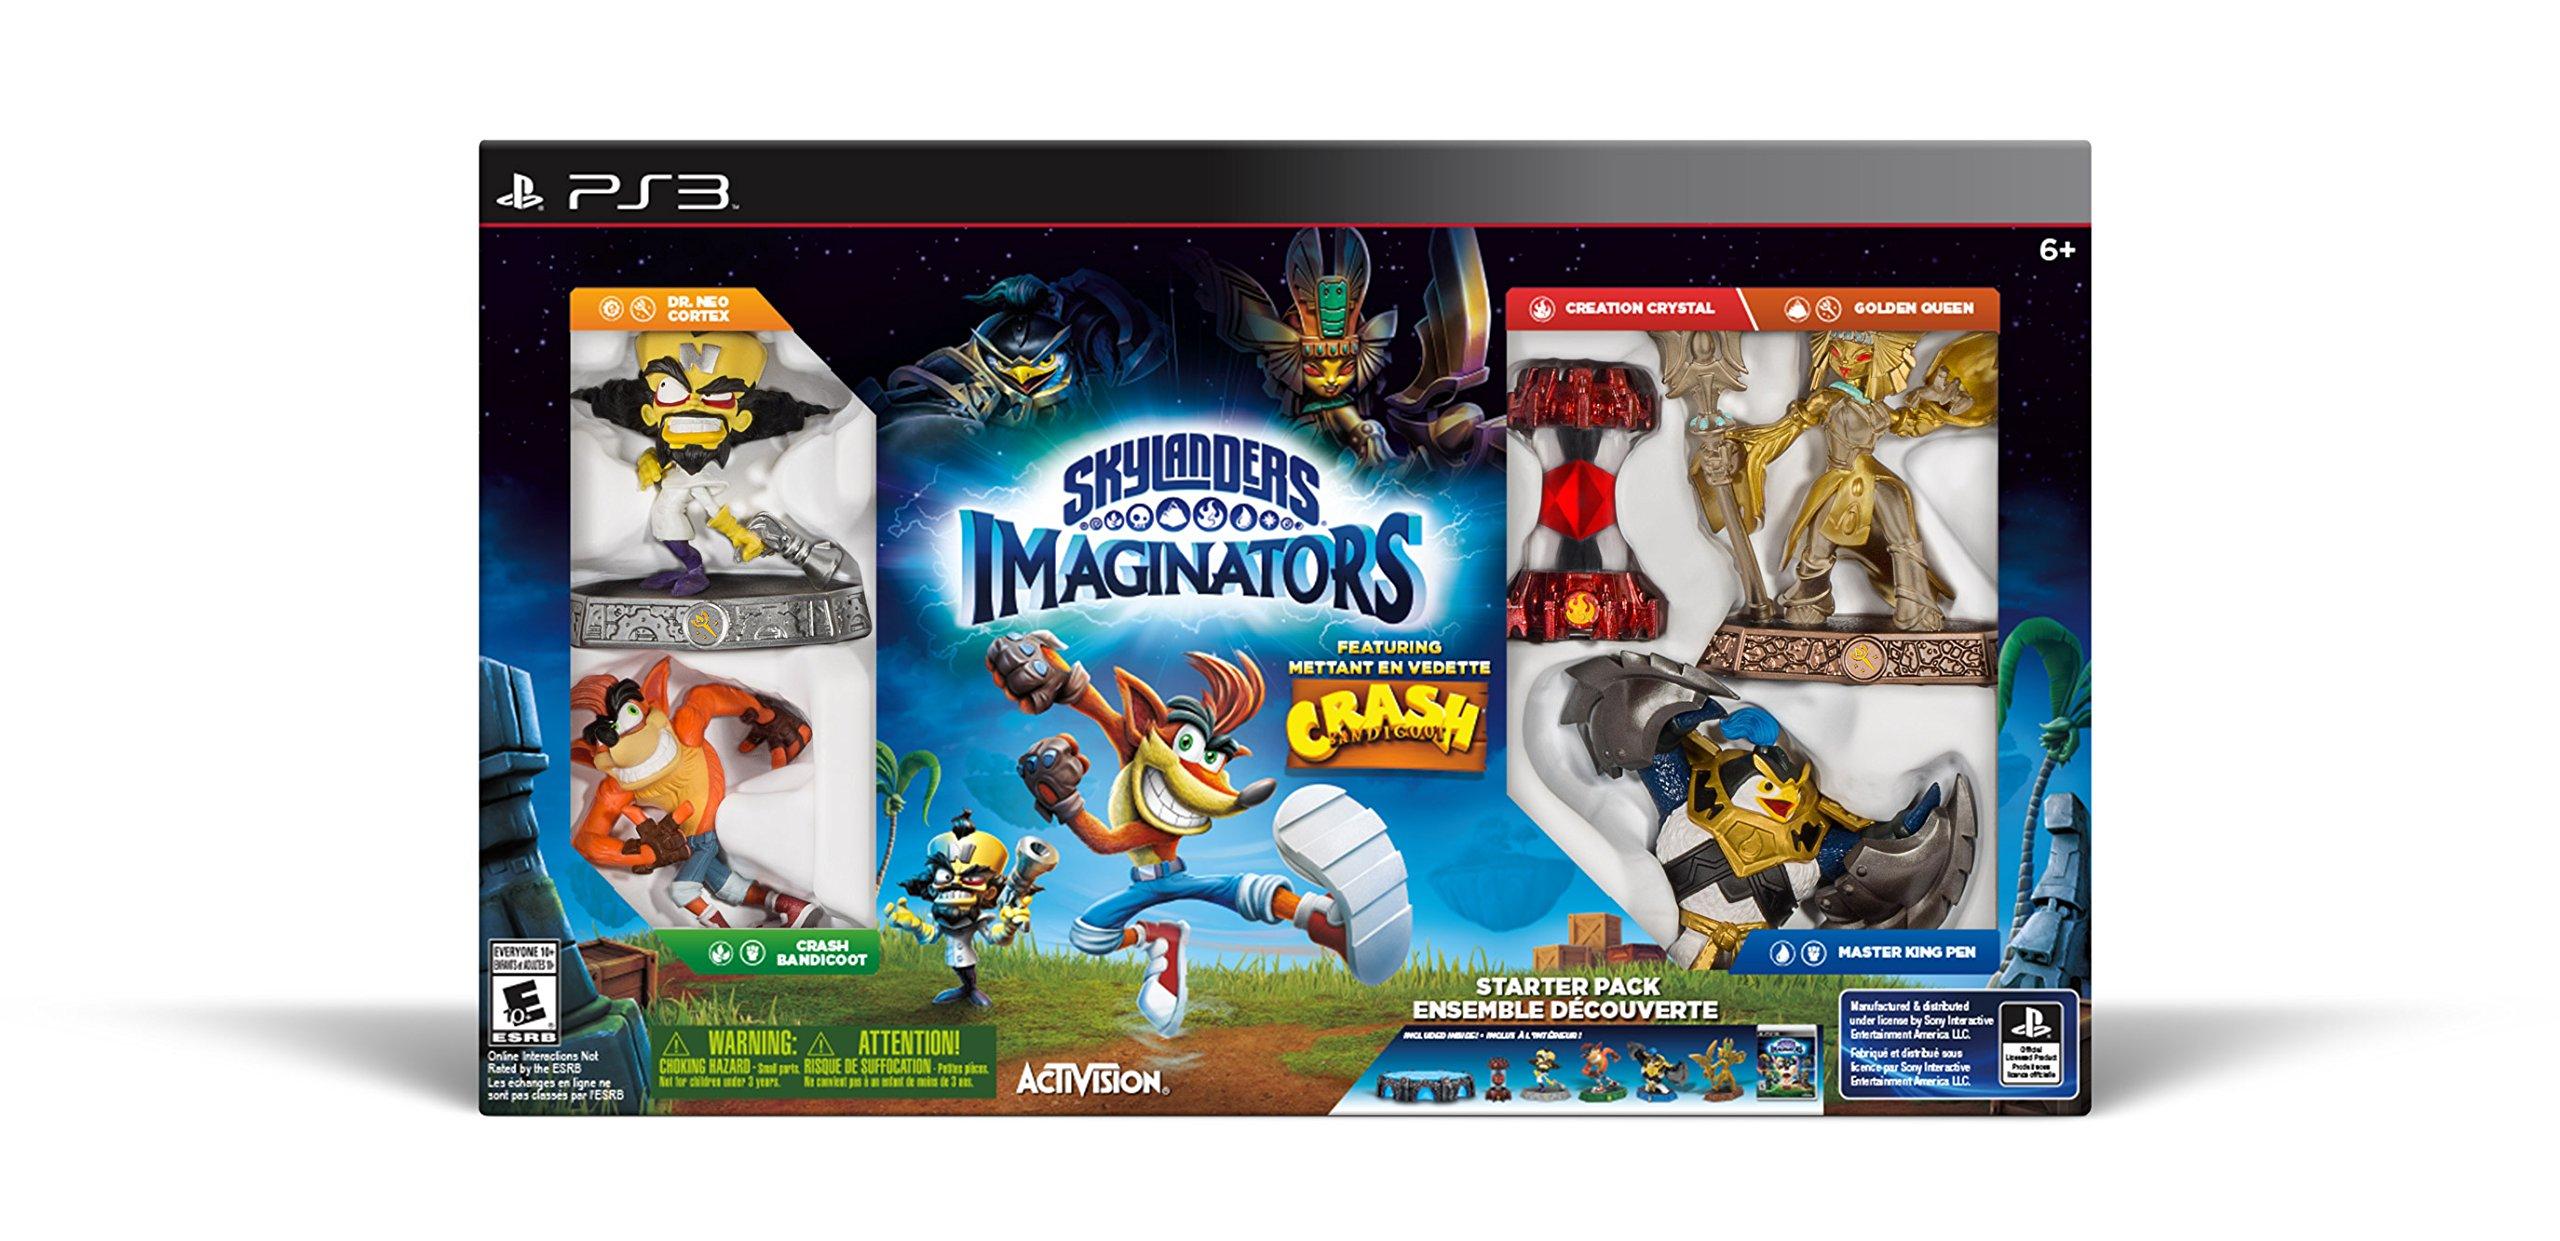 Skylanders Imaginators - Crash Bandicoot Edition - PlayStation 3